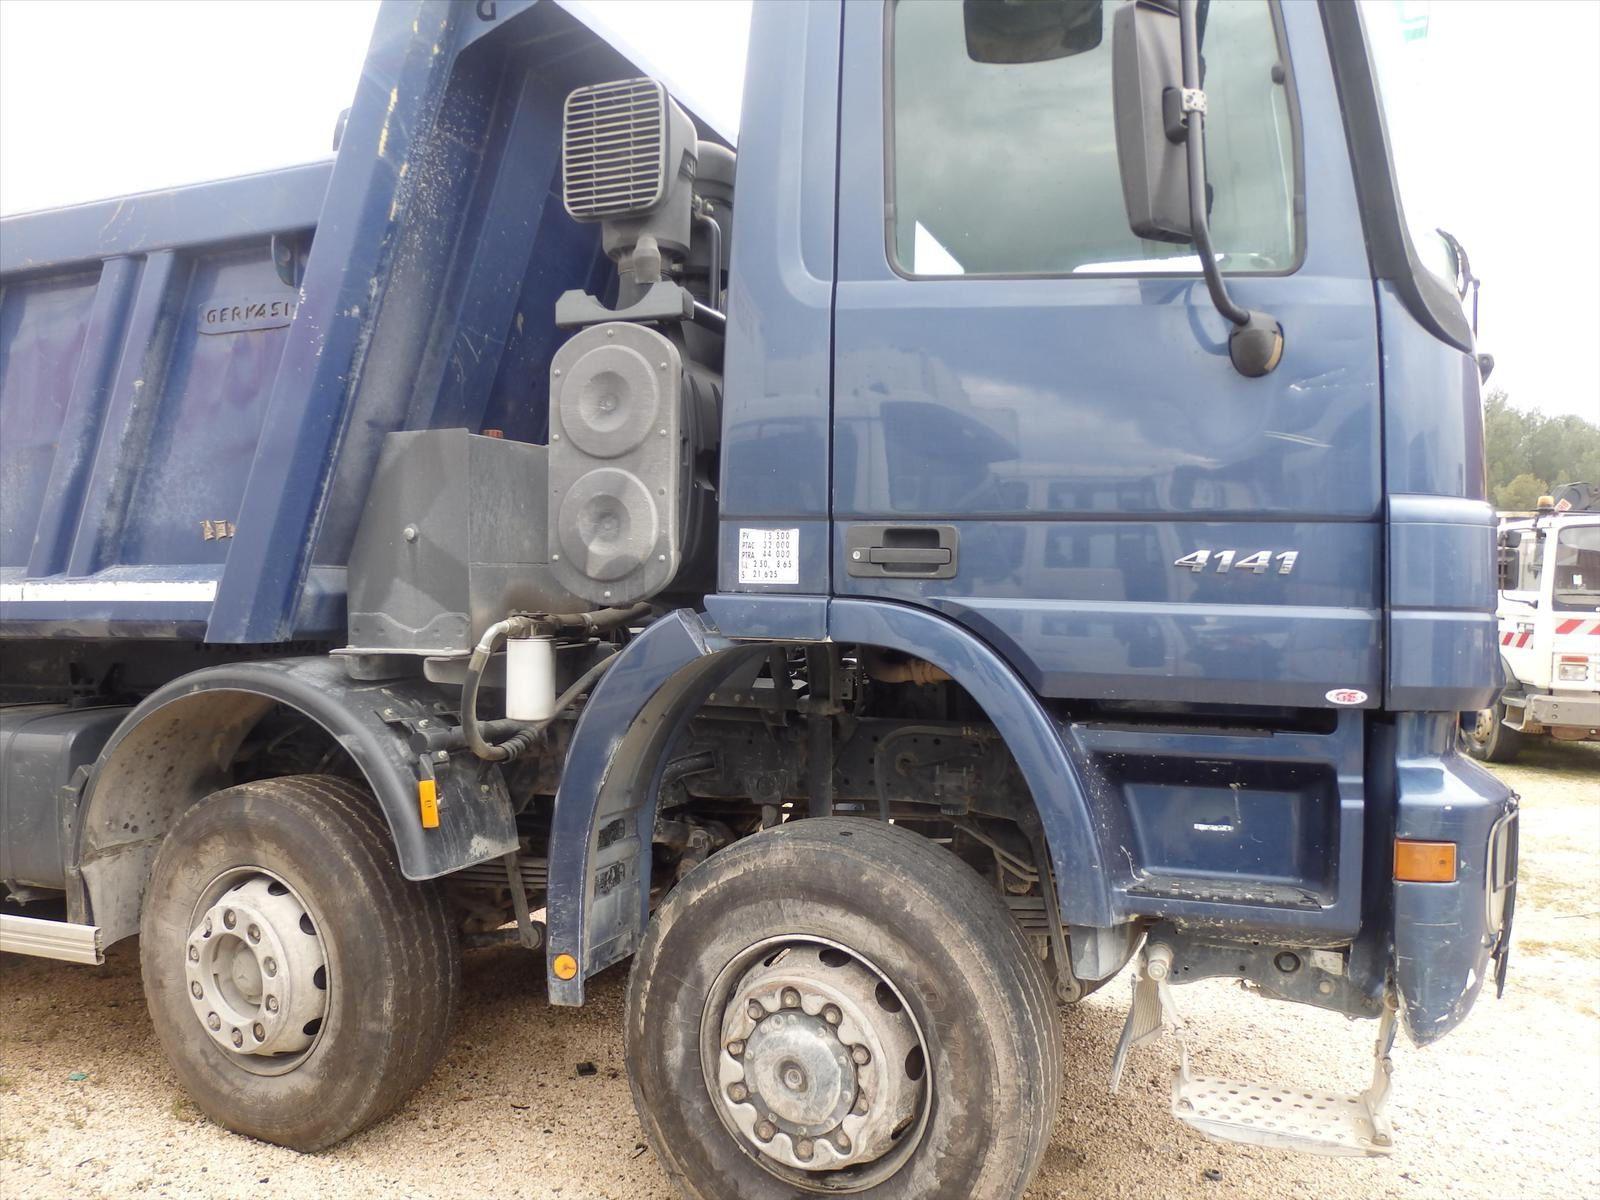 Camion MERCEDES ACTROS 4141 8x6 Benne Tel: 0608066192 TRANSCOMM13 Pierre BASSAT